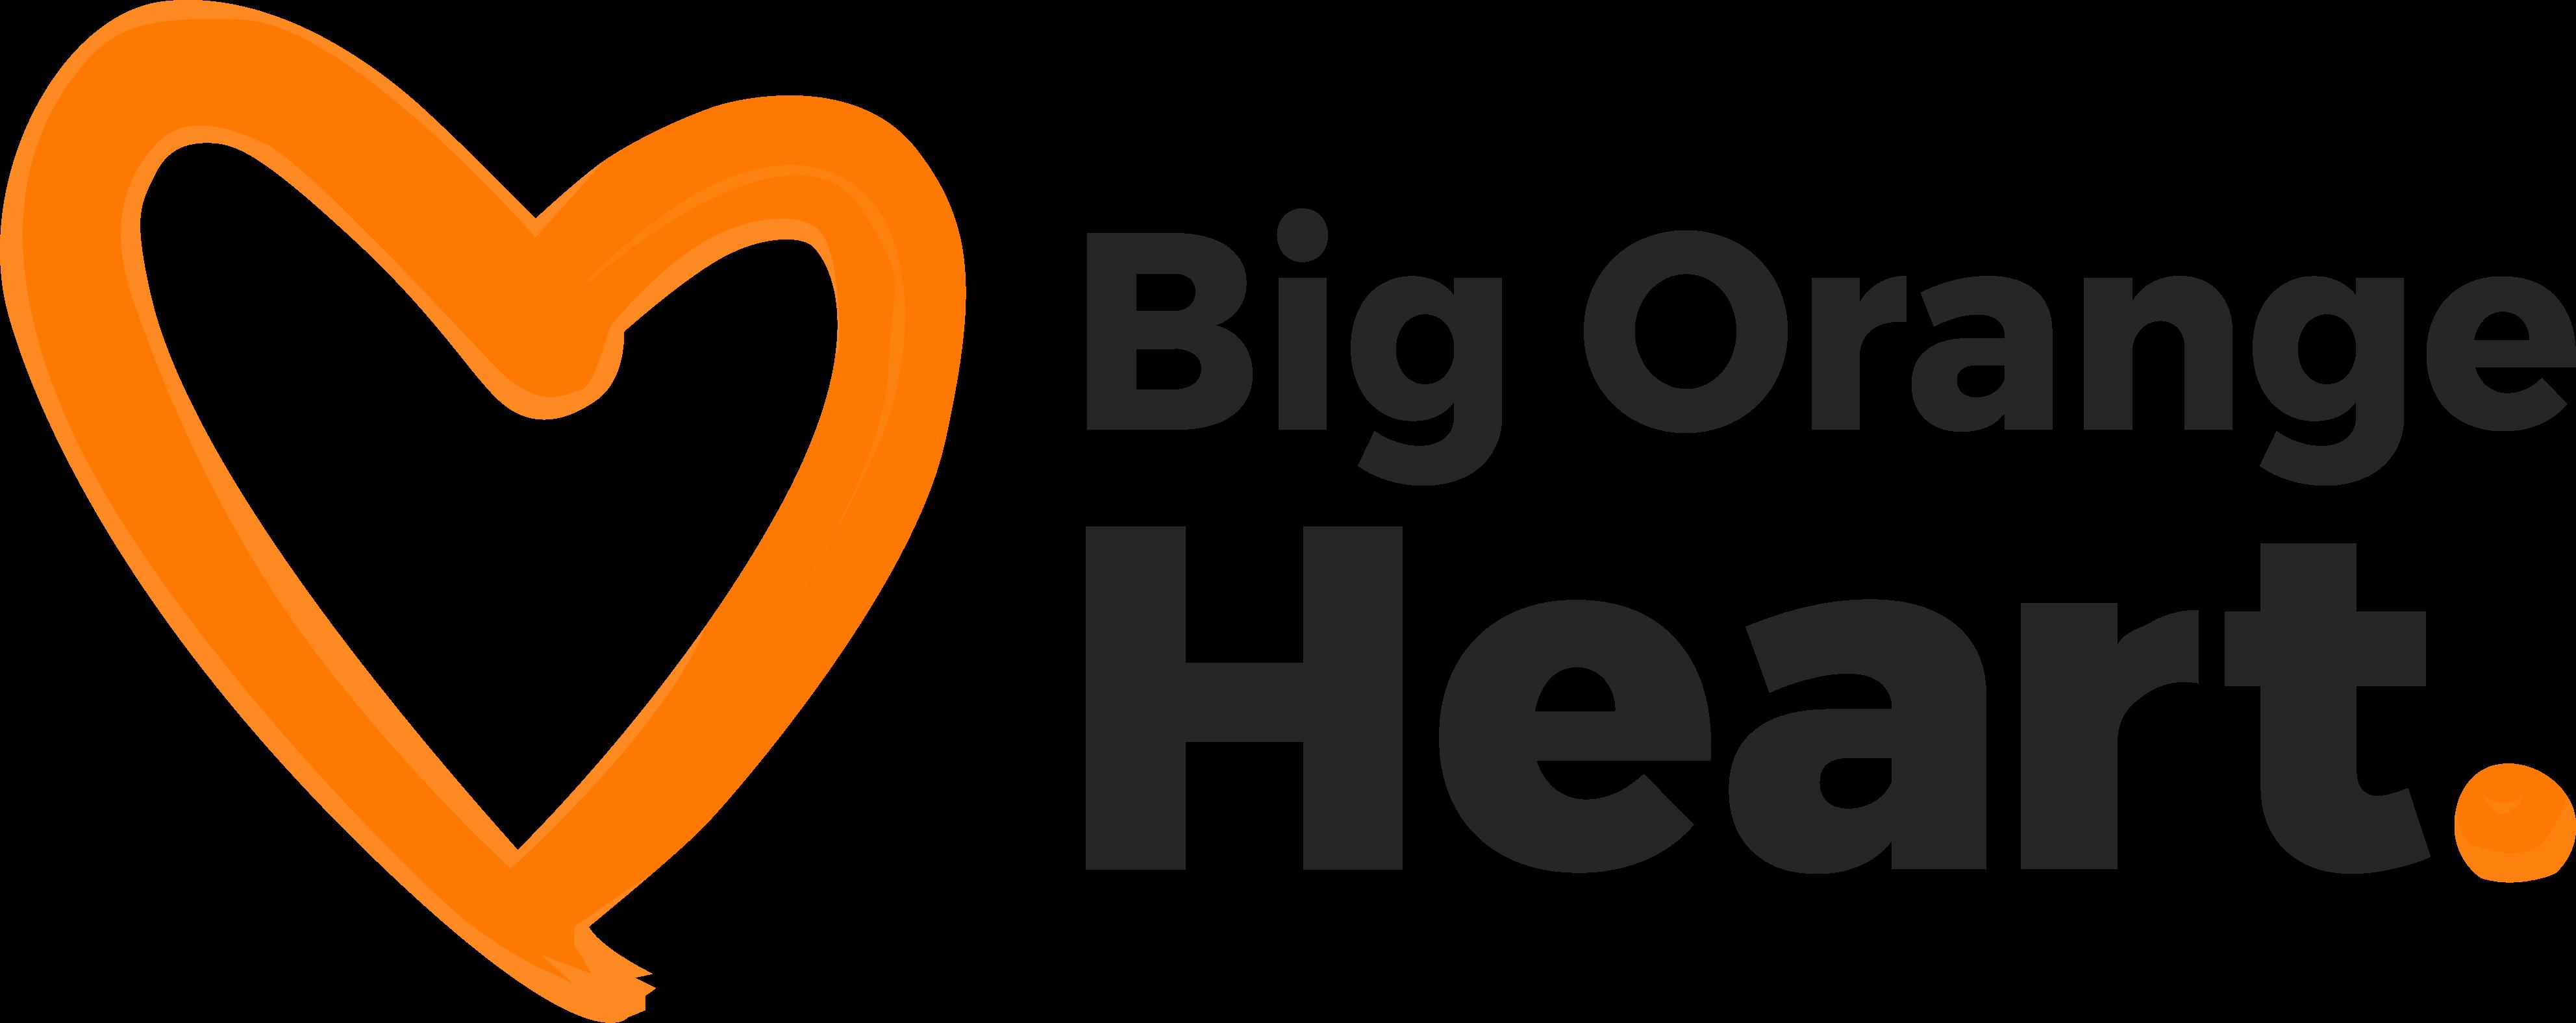 Big Orange Heart